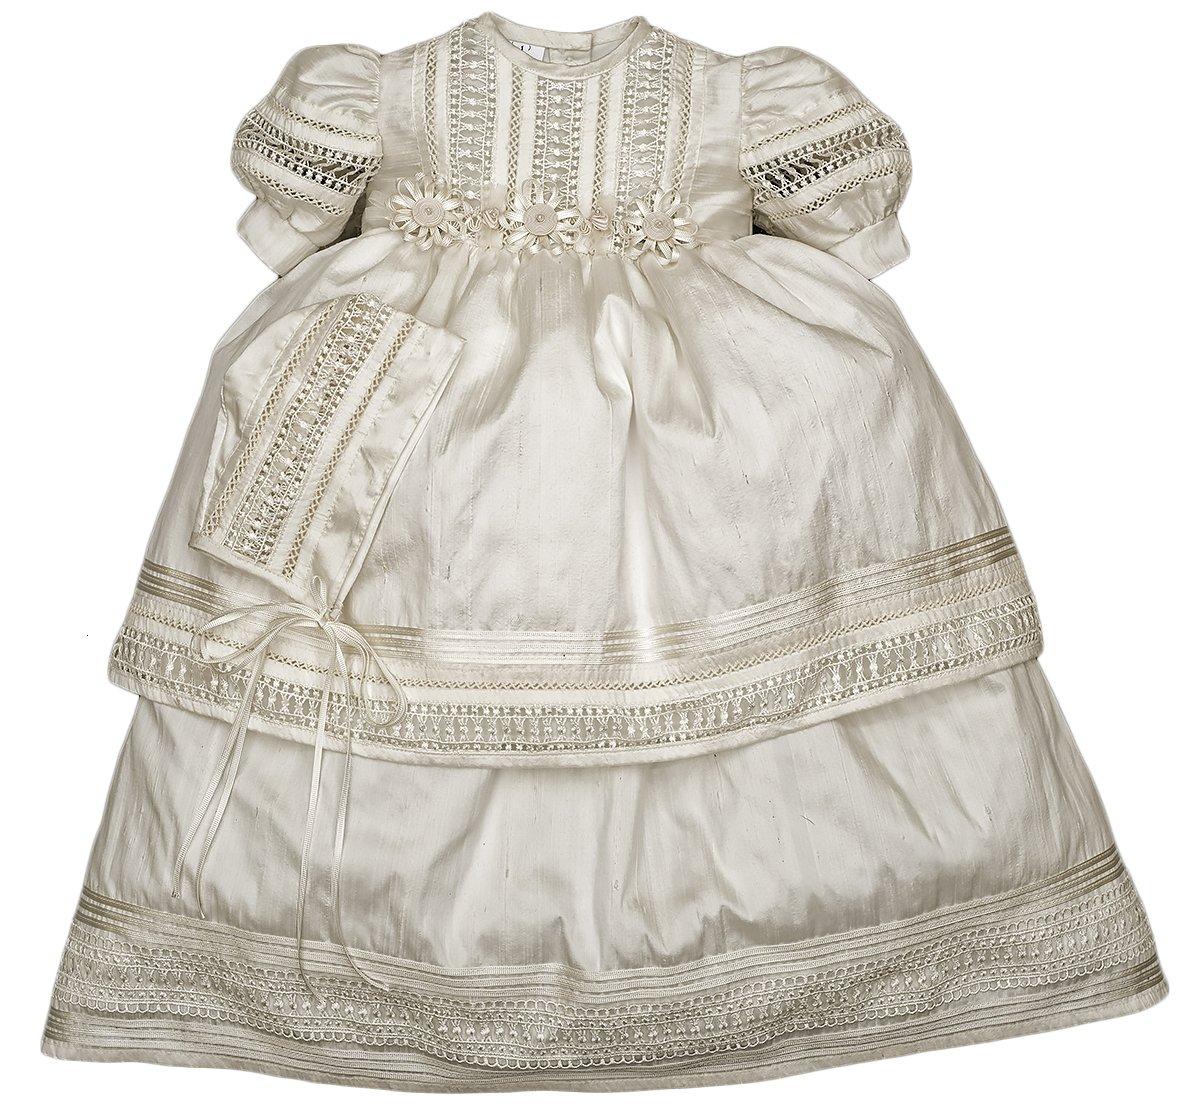 Elegant Baby Girl Christening Baptism Dress - Ivory or White (24-36 Months, Ivory)